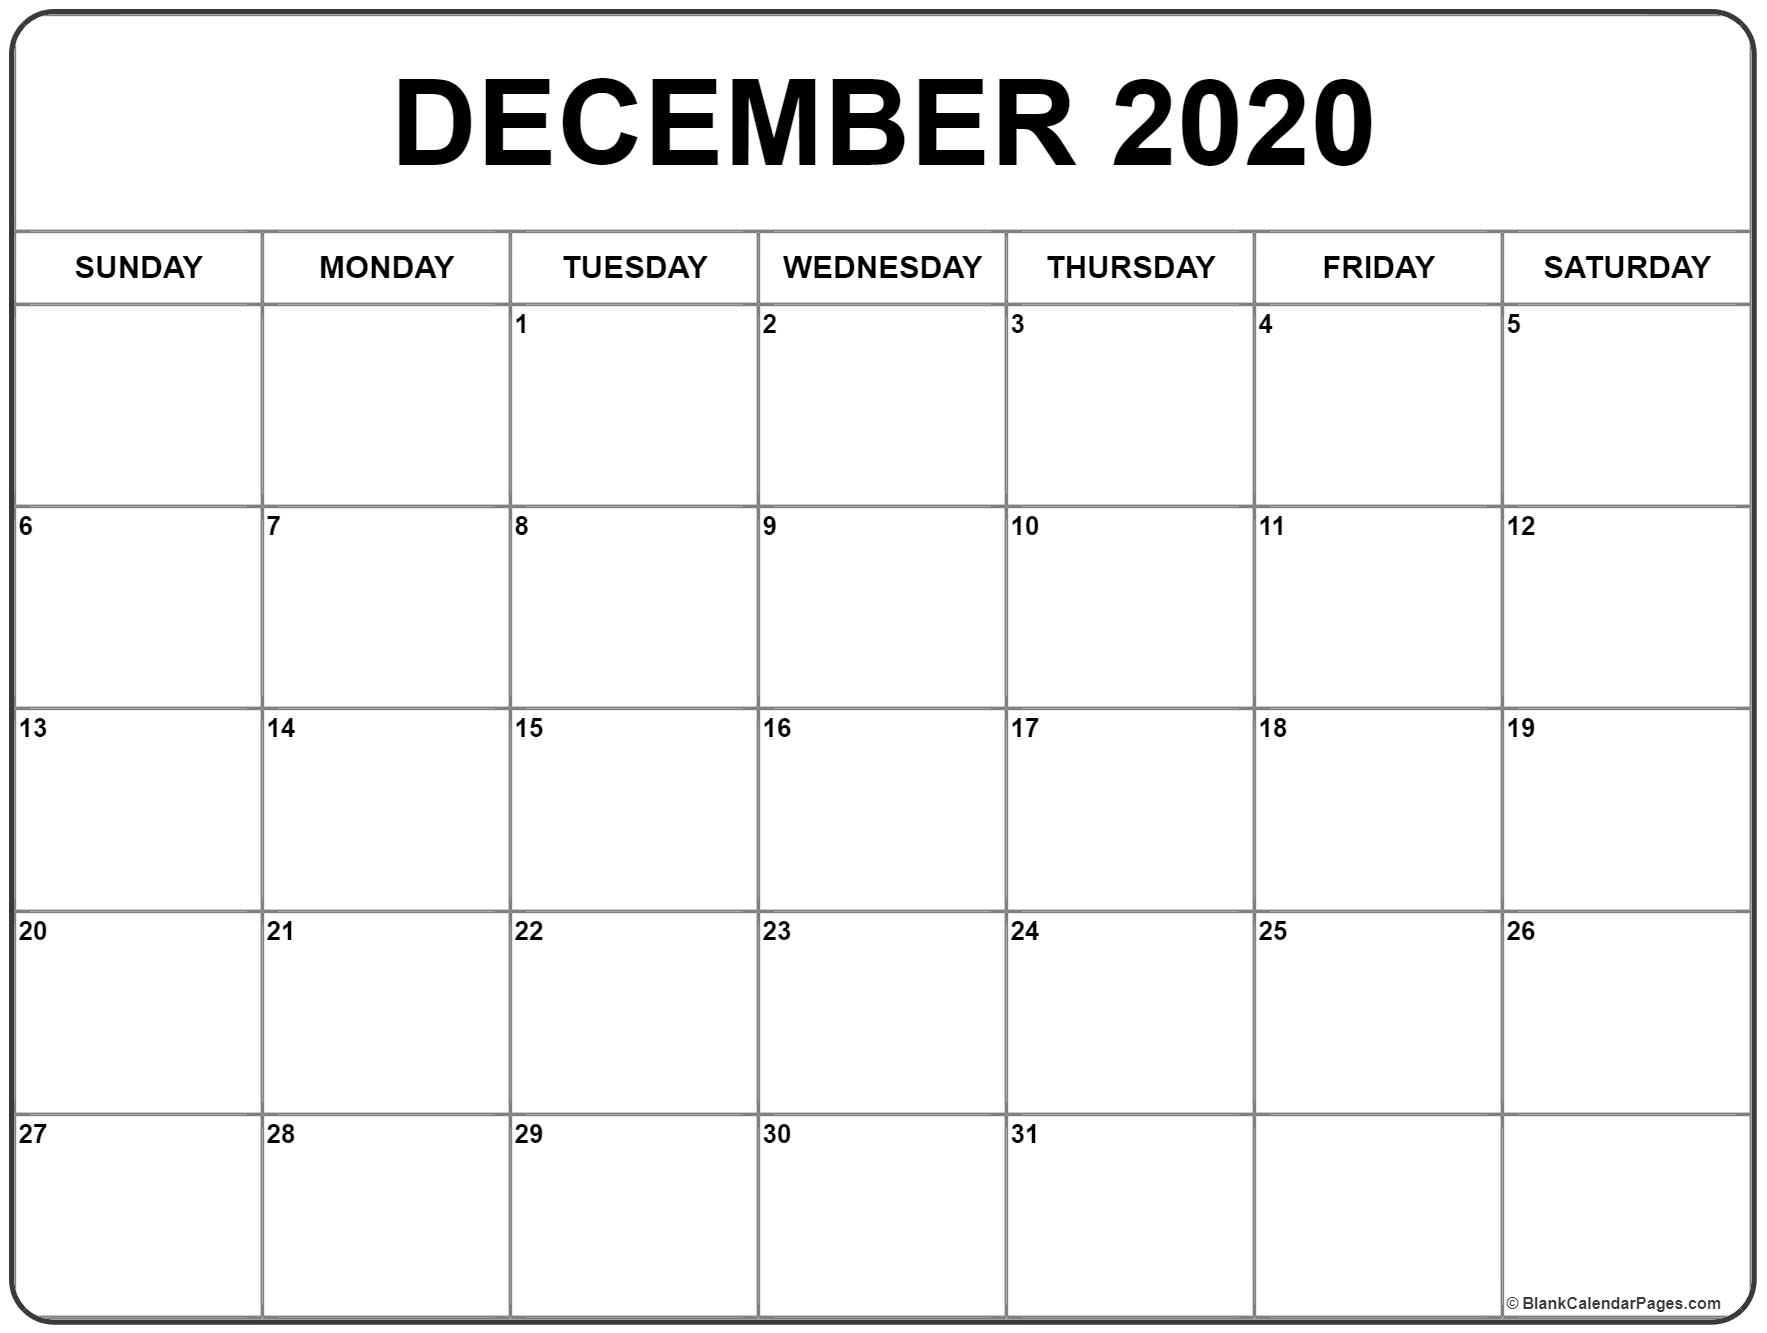 December Blank Calendar 2020 - Wpa.wpart.co